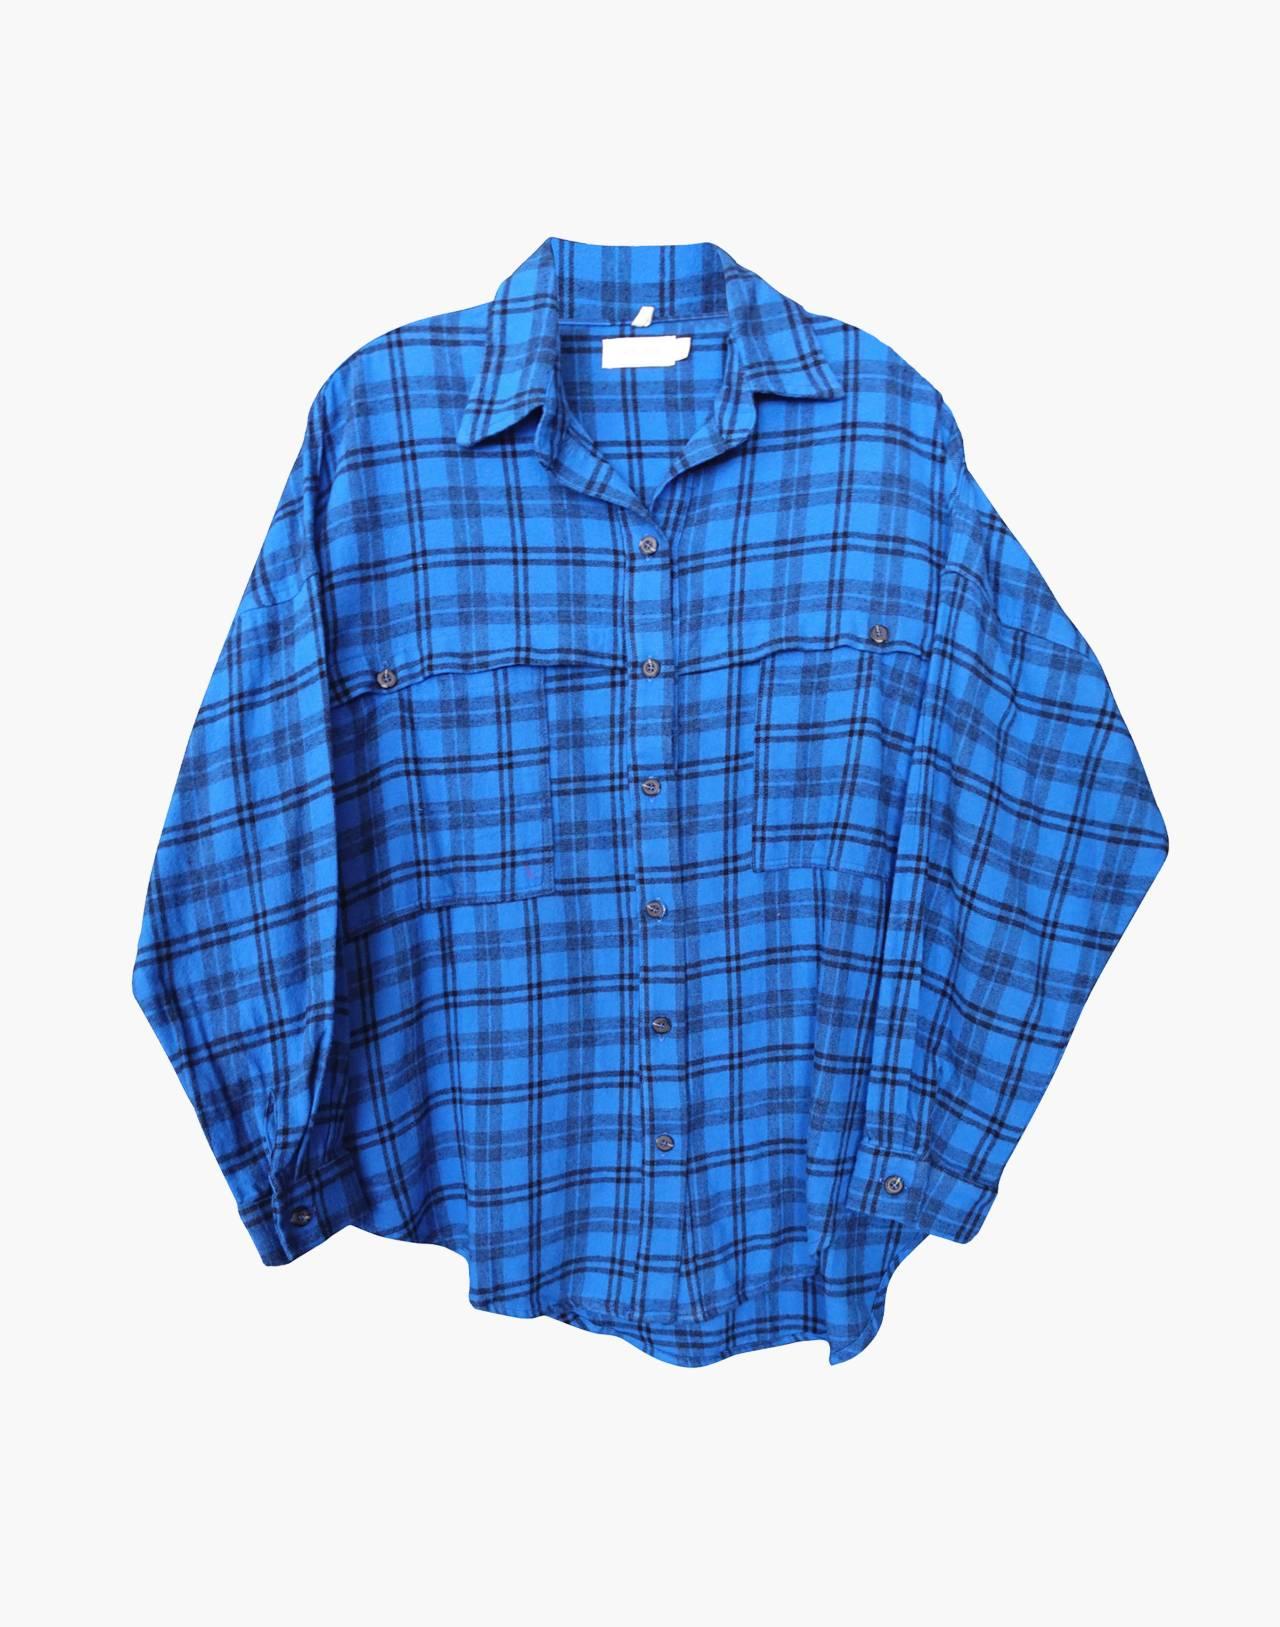 NICO NICO™ Alanis Plaid Button-Down Shirt in blue image 1